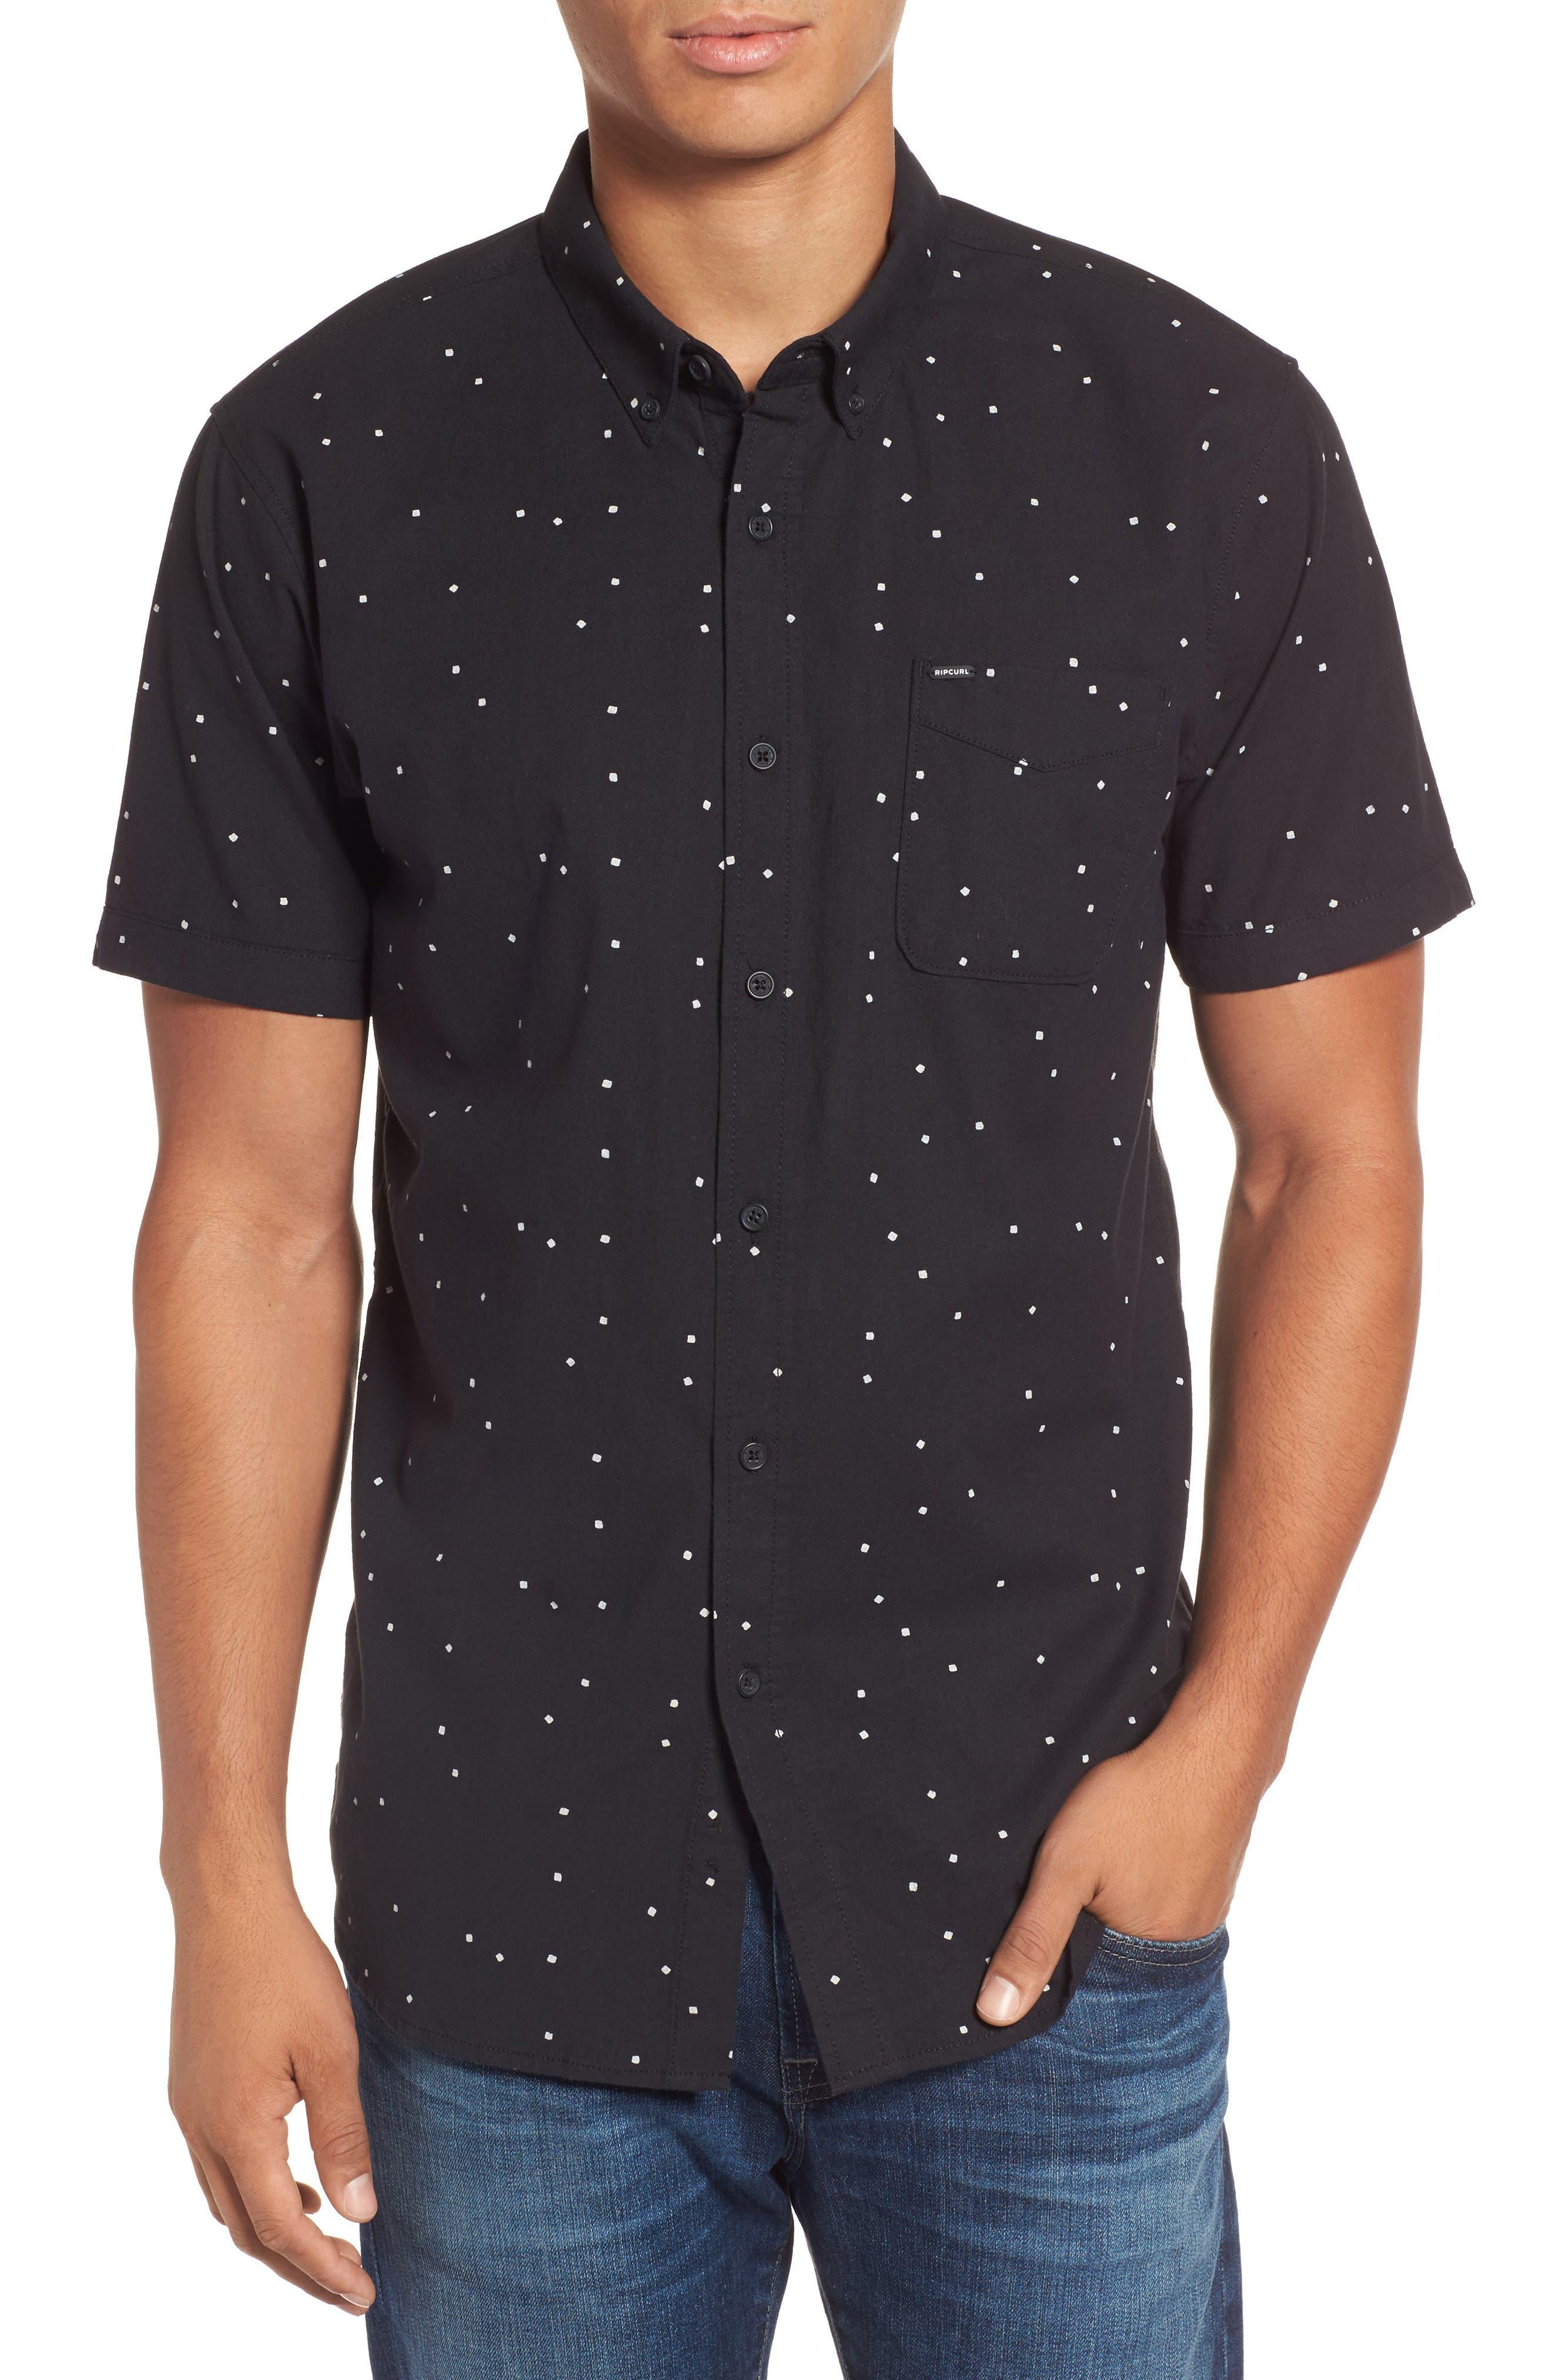 Main Image - Rip Curl Mixter Short Sleeve Shirt